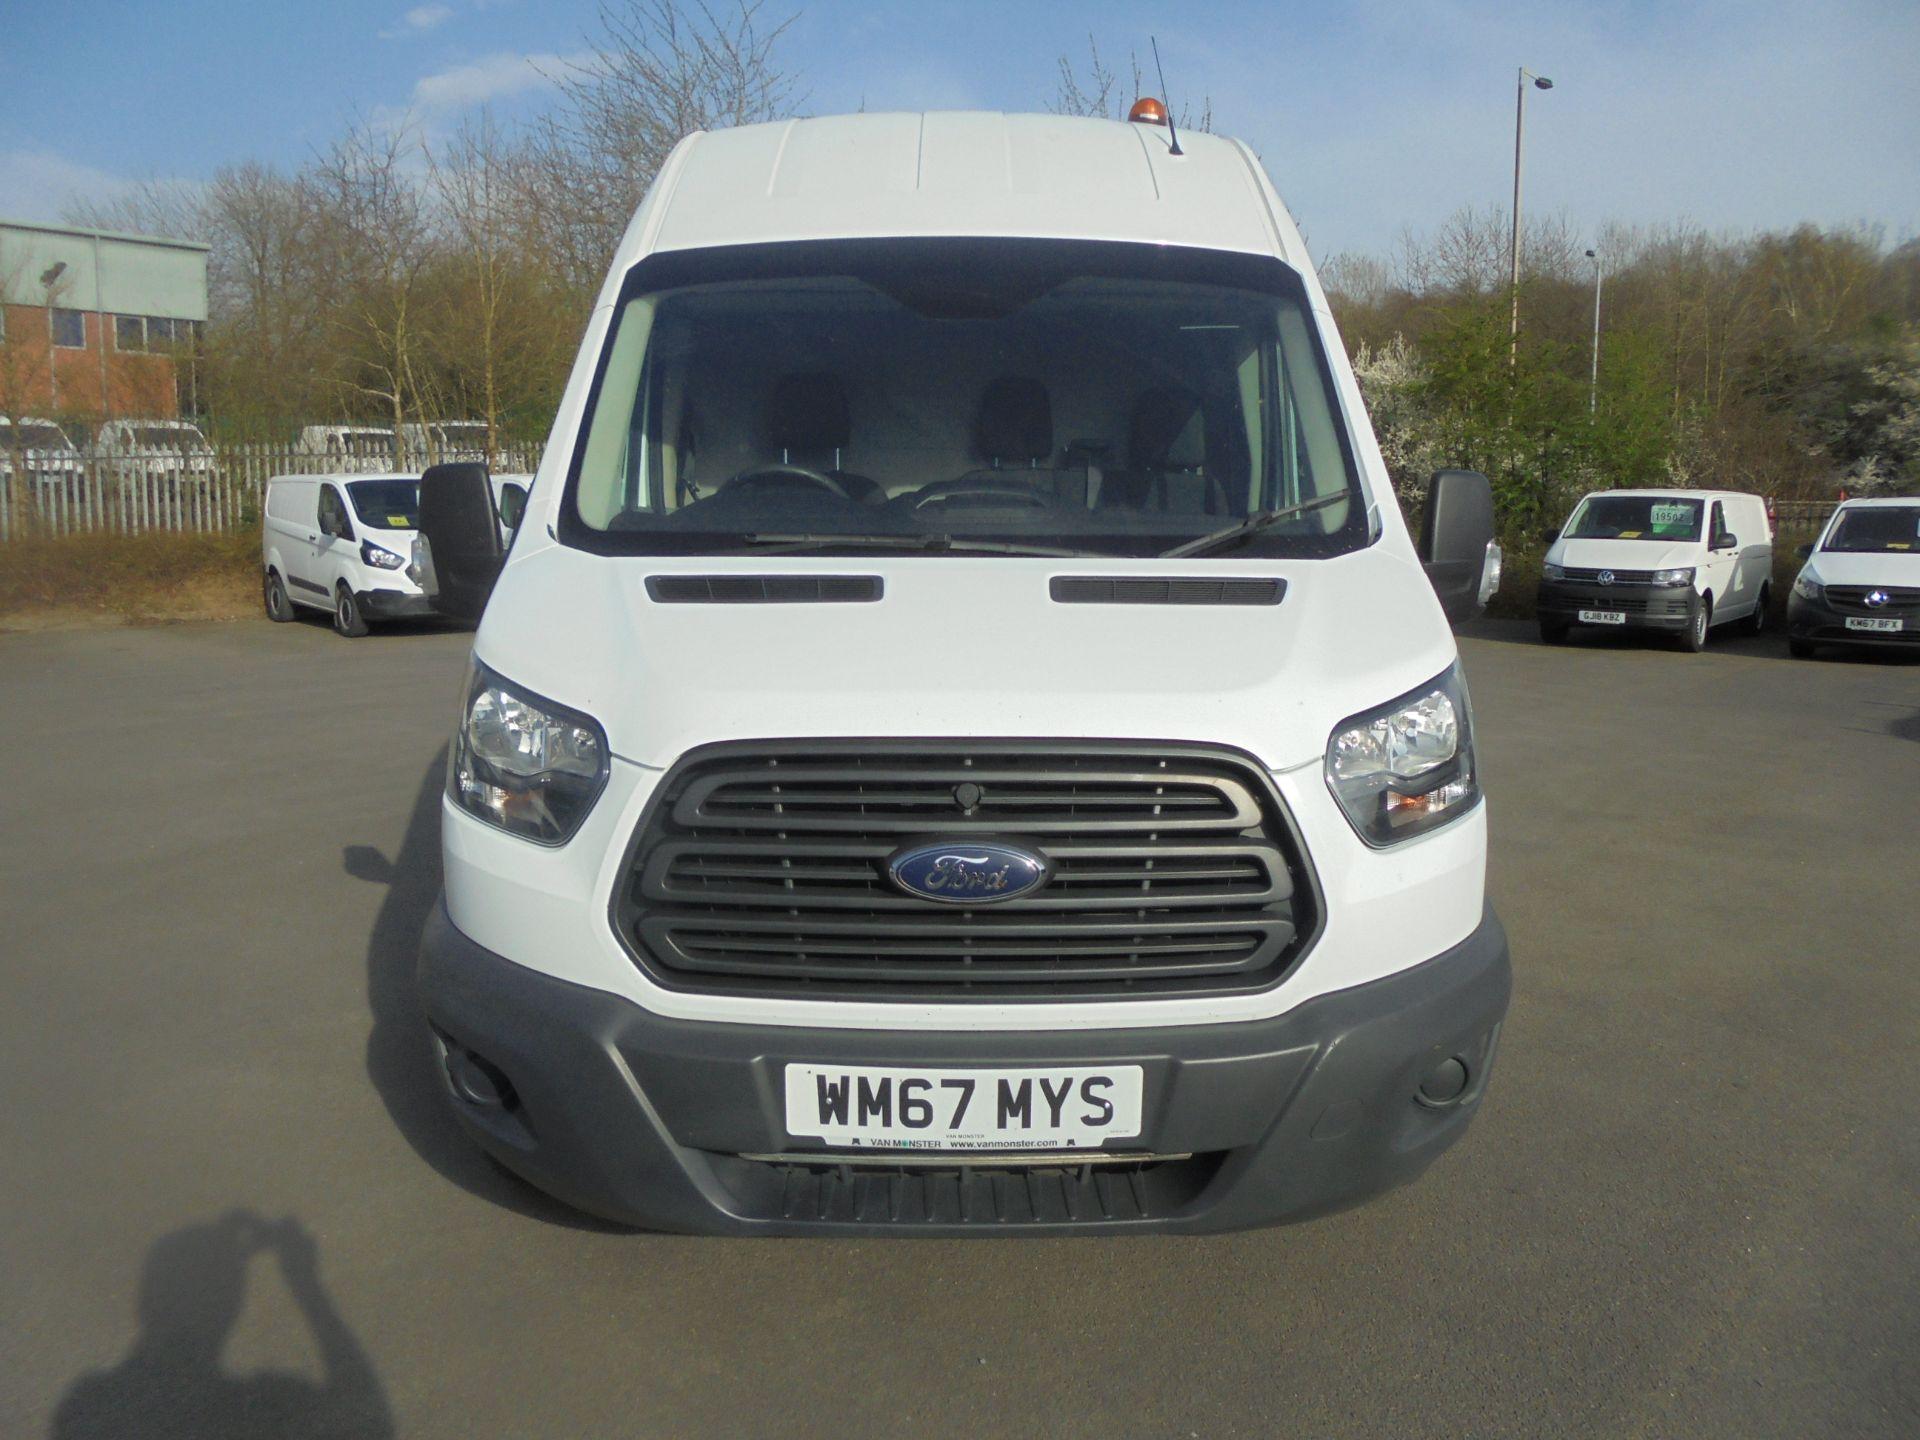 2018 Ford Transit 2.0 Tdci 130Ps H3 Van (WM67MYS) Image 2